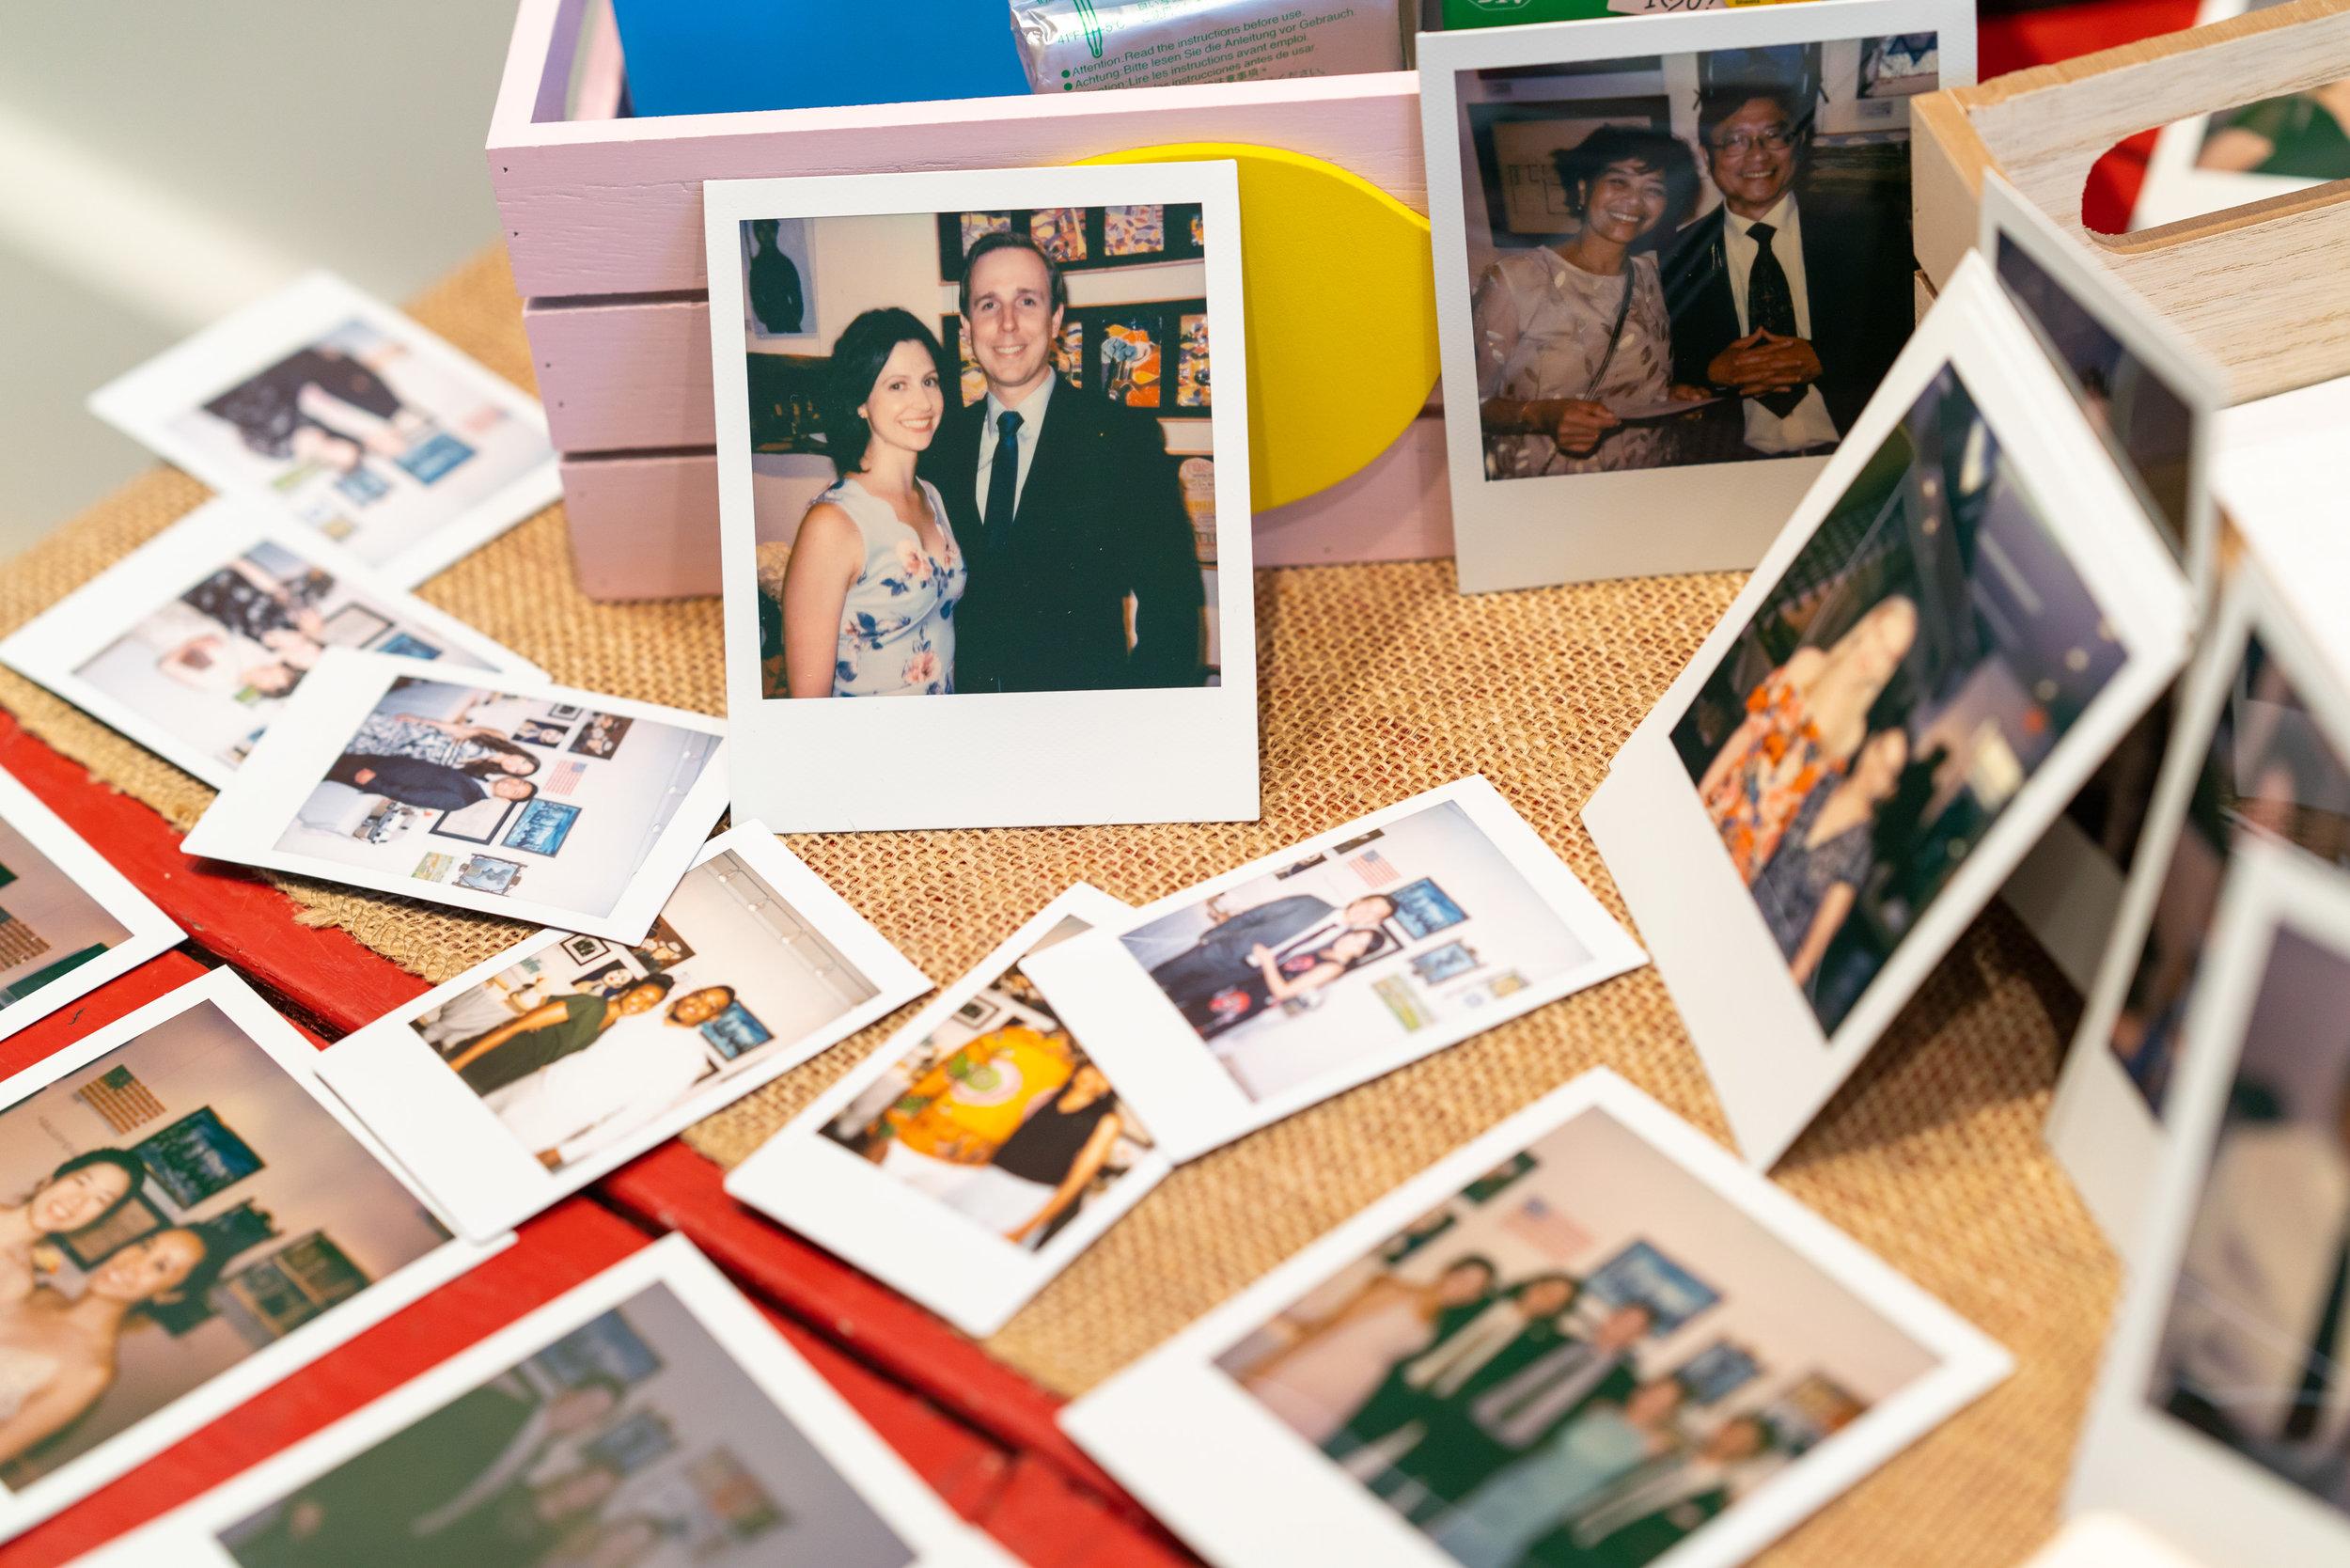 Kodak film camera at a washington dc wedding